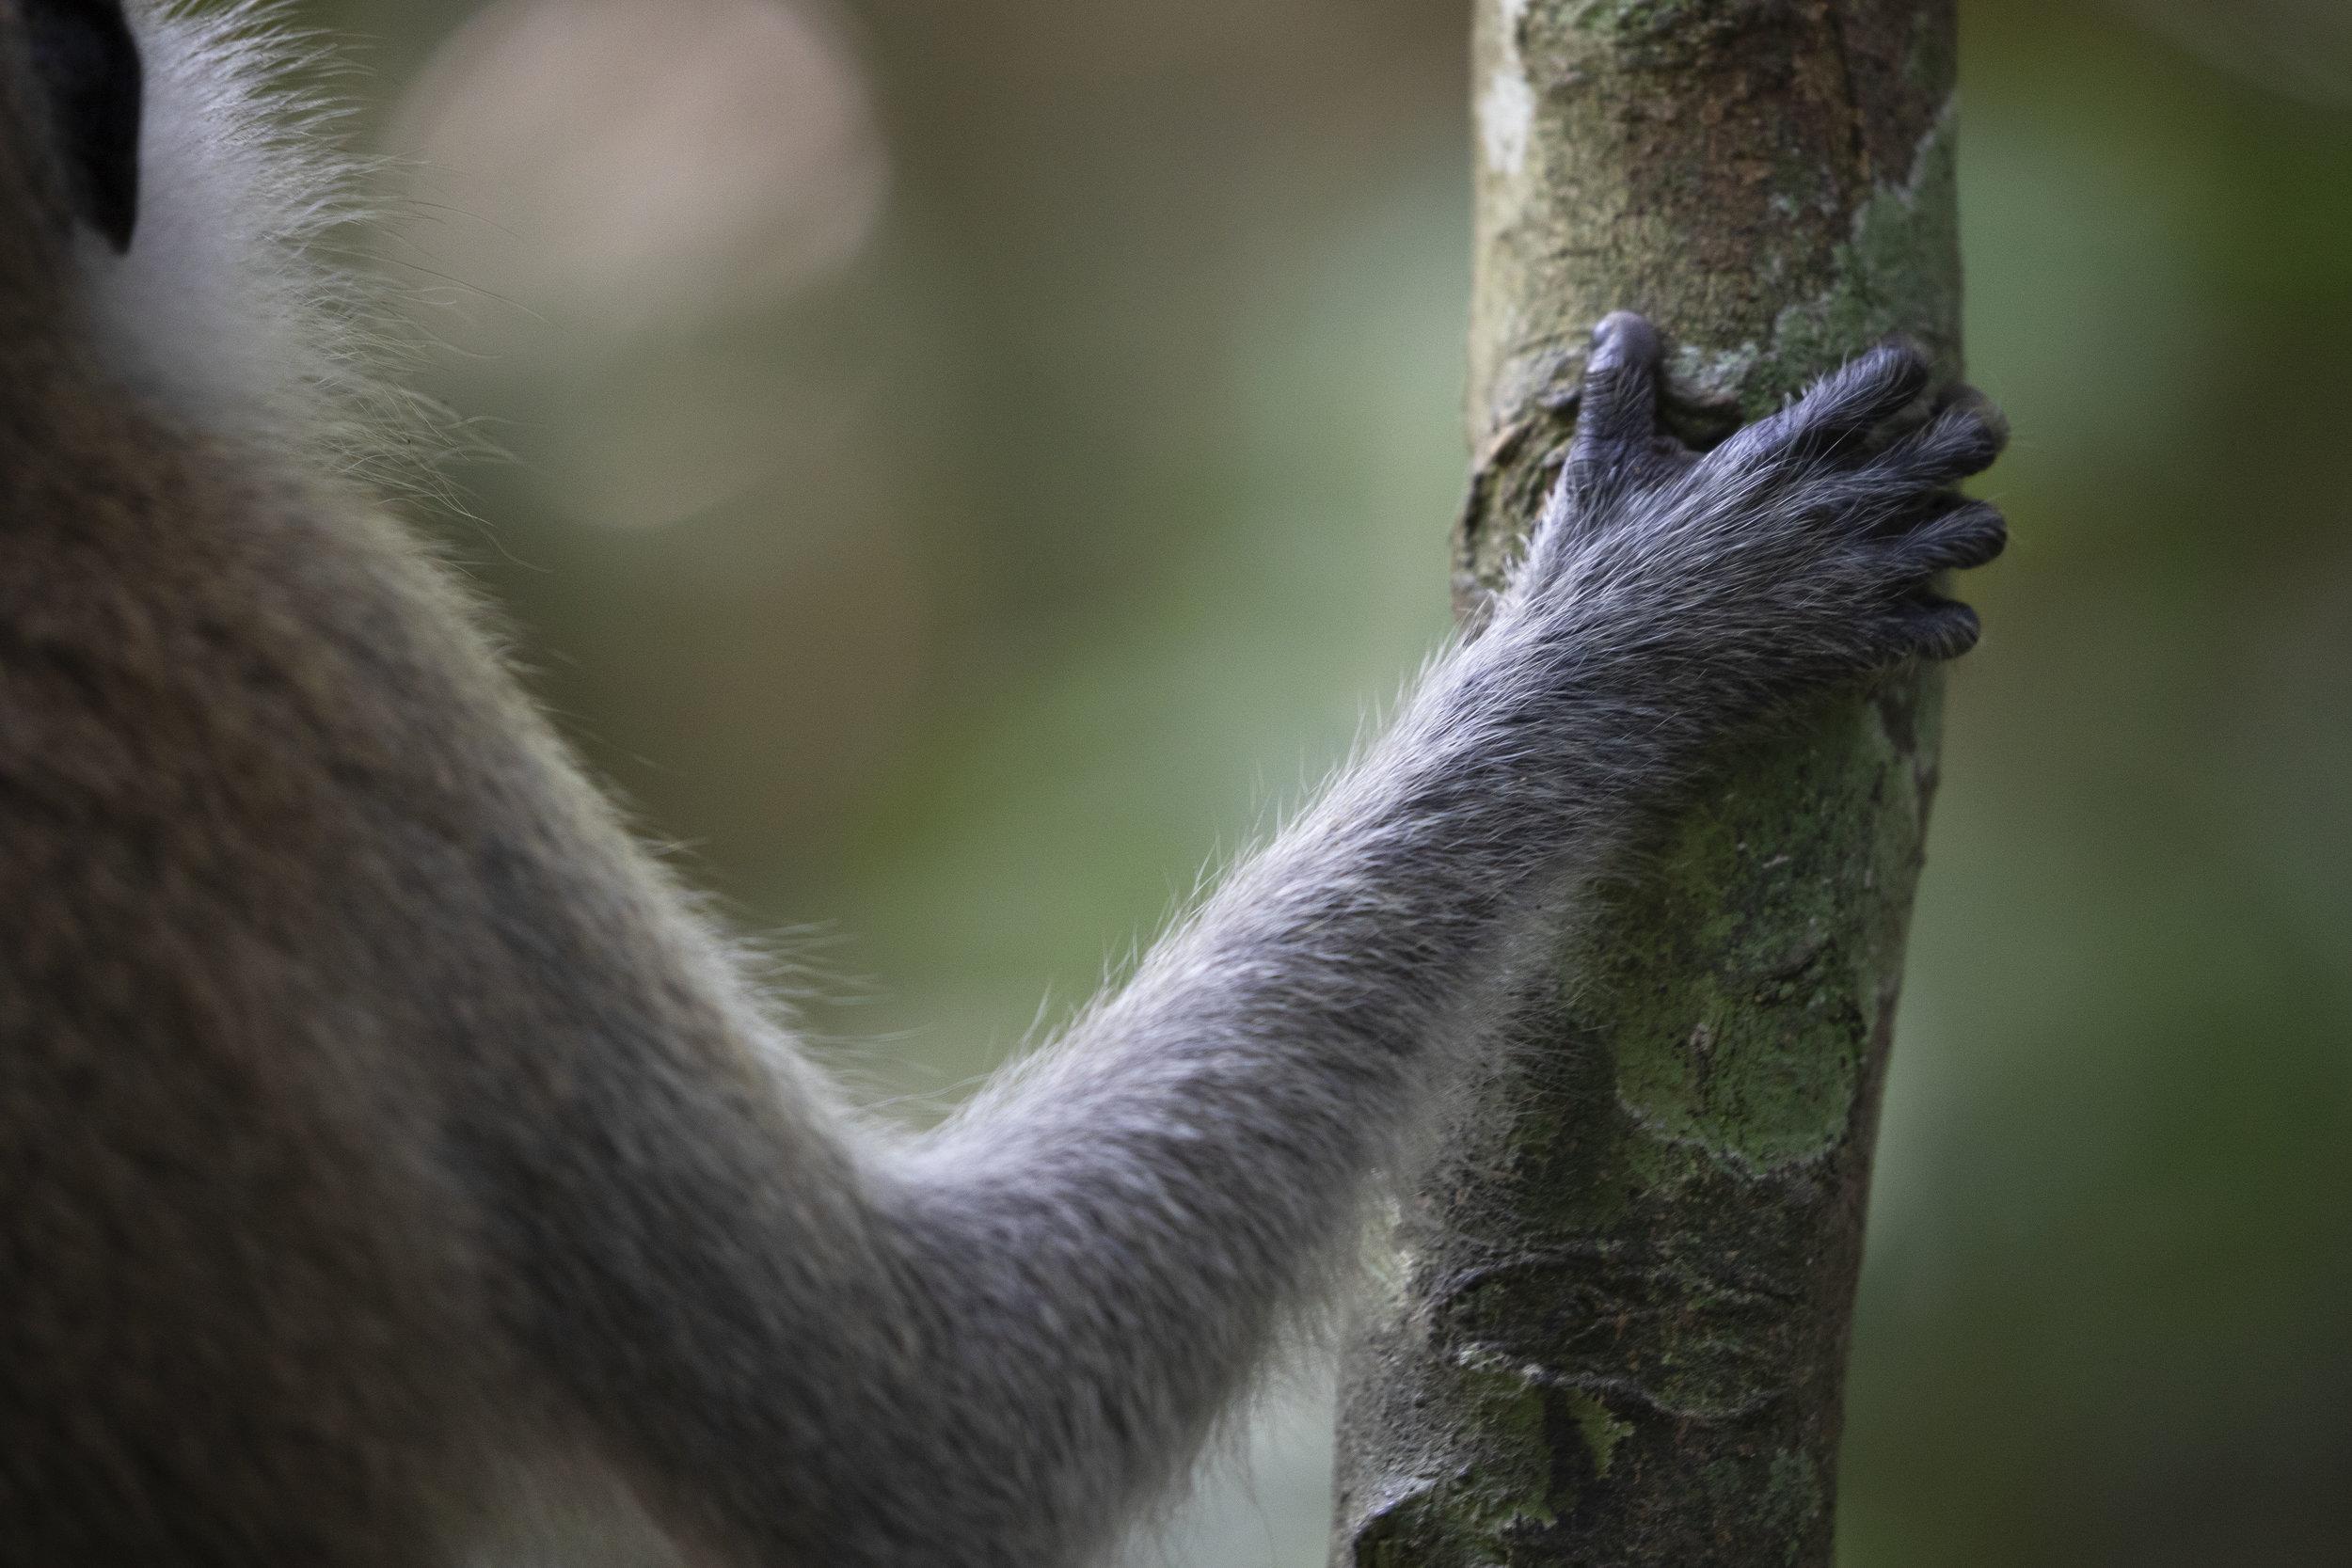 Monkey Hand, Malaysia 2019